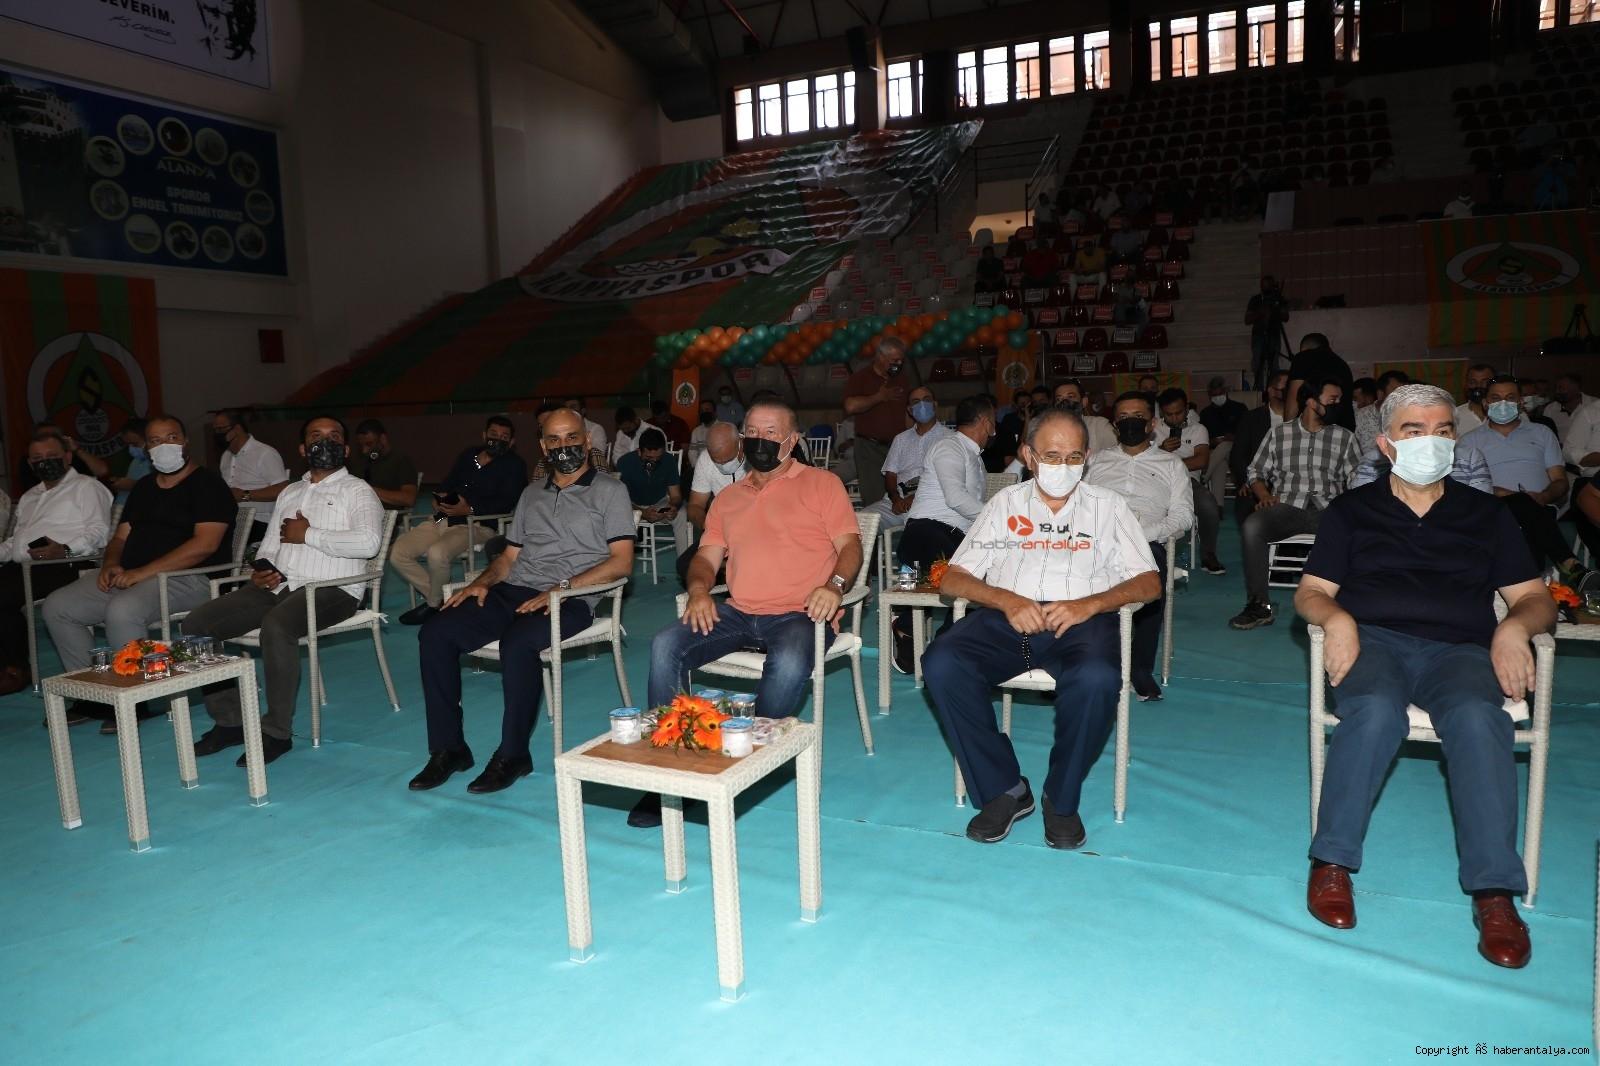 2021/06/alanyasporda-hasan-cavusoglu-guven-tazeledi-20210609AW34-3.jpg